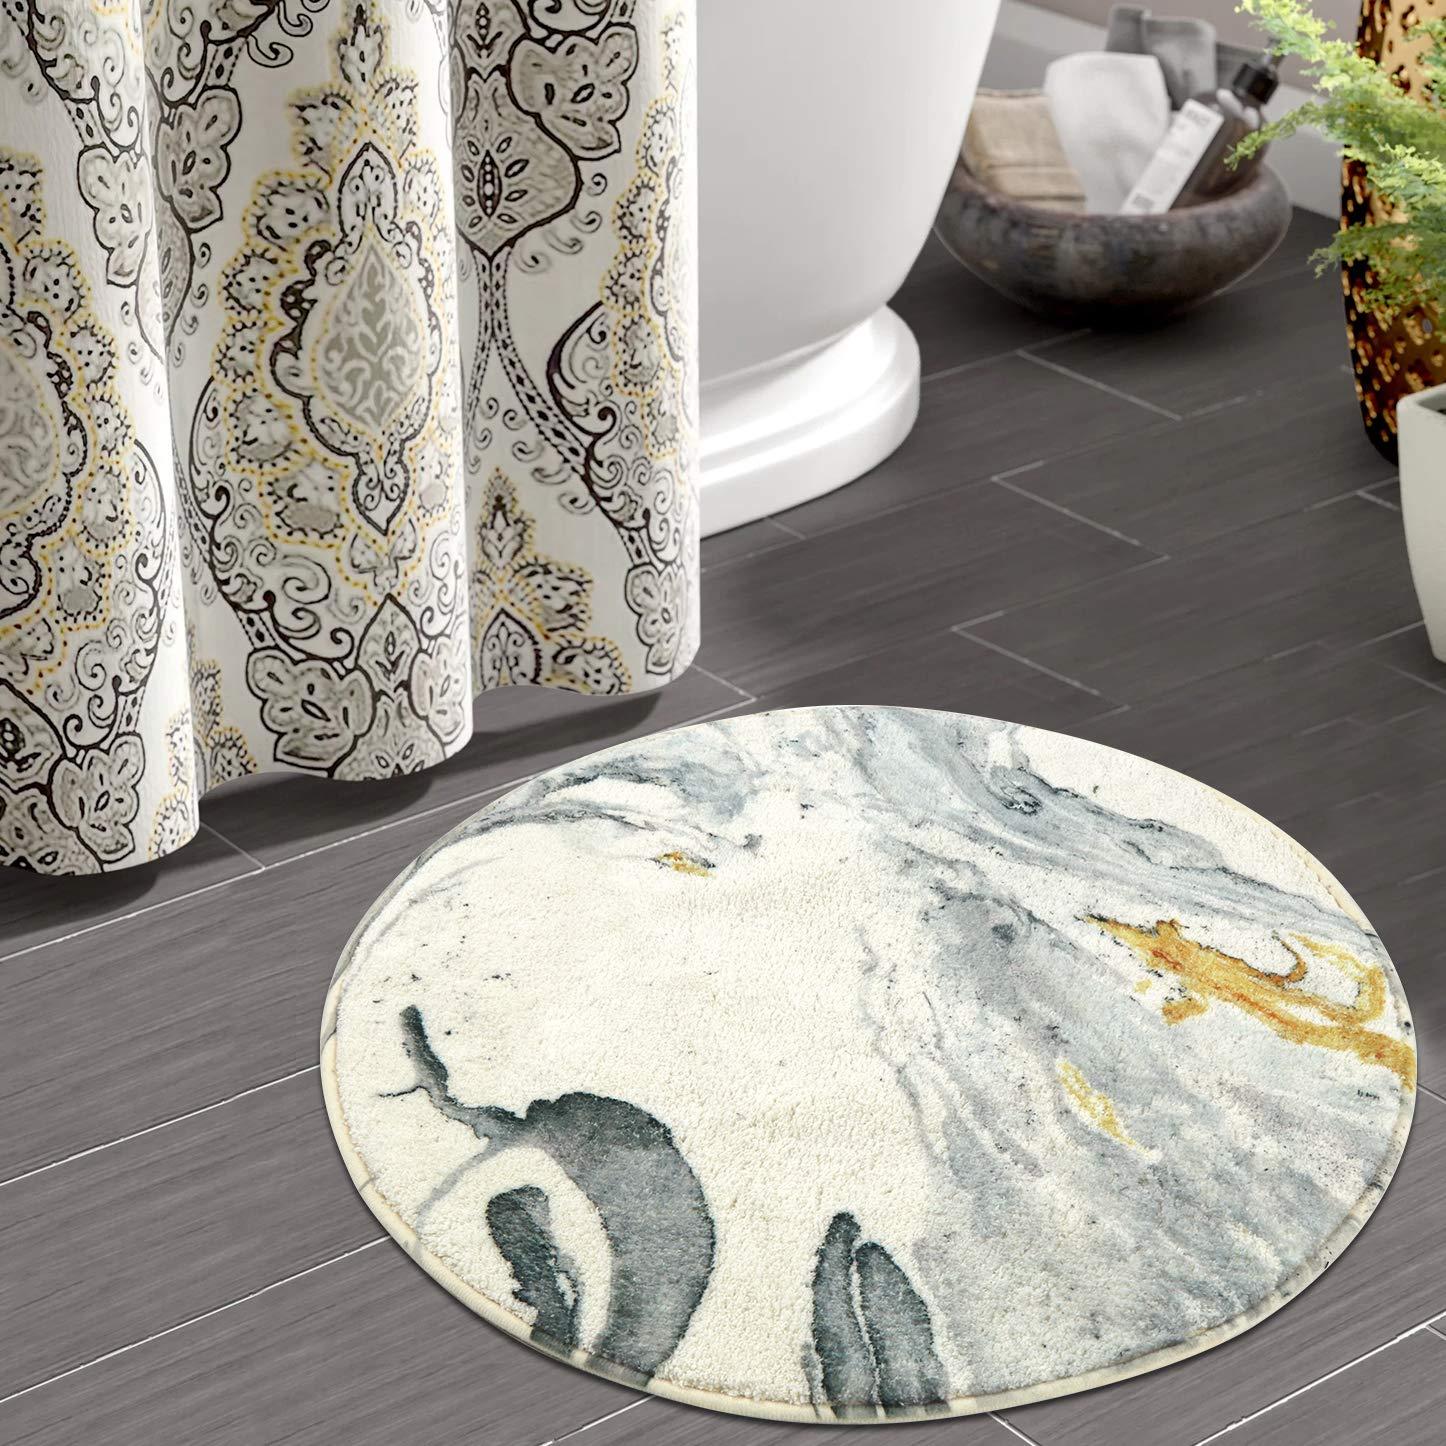 Haocoo Round Bathroom Rugs 2ft Beige Marble Velvet Bath Mat Non Slip Door Carpet Soft Luxury Microfiber Machine Washable Buy Online In Bahrain At Bahrain Desertcart Com Productid 157503062